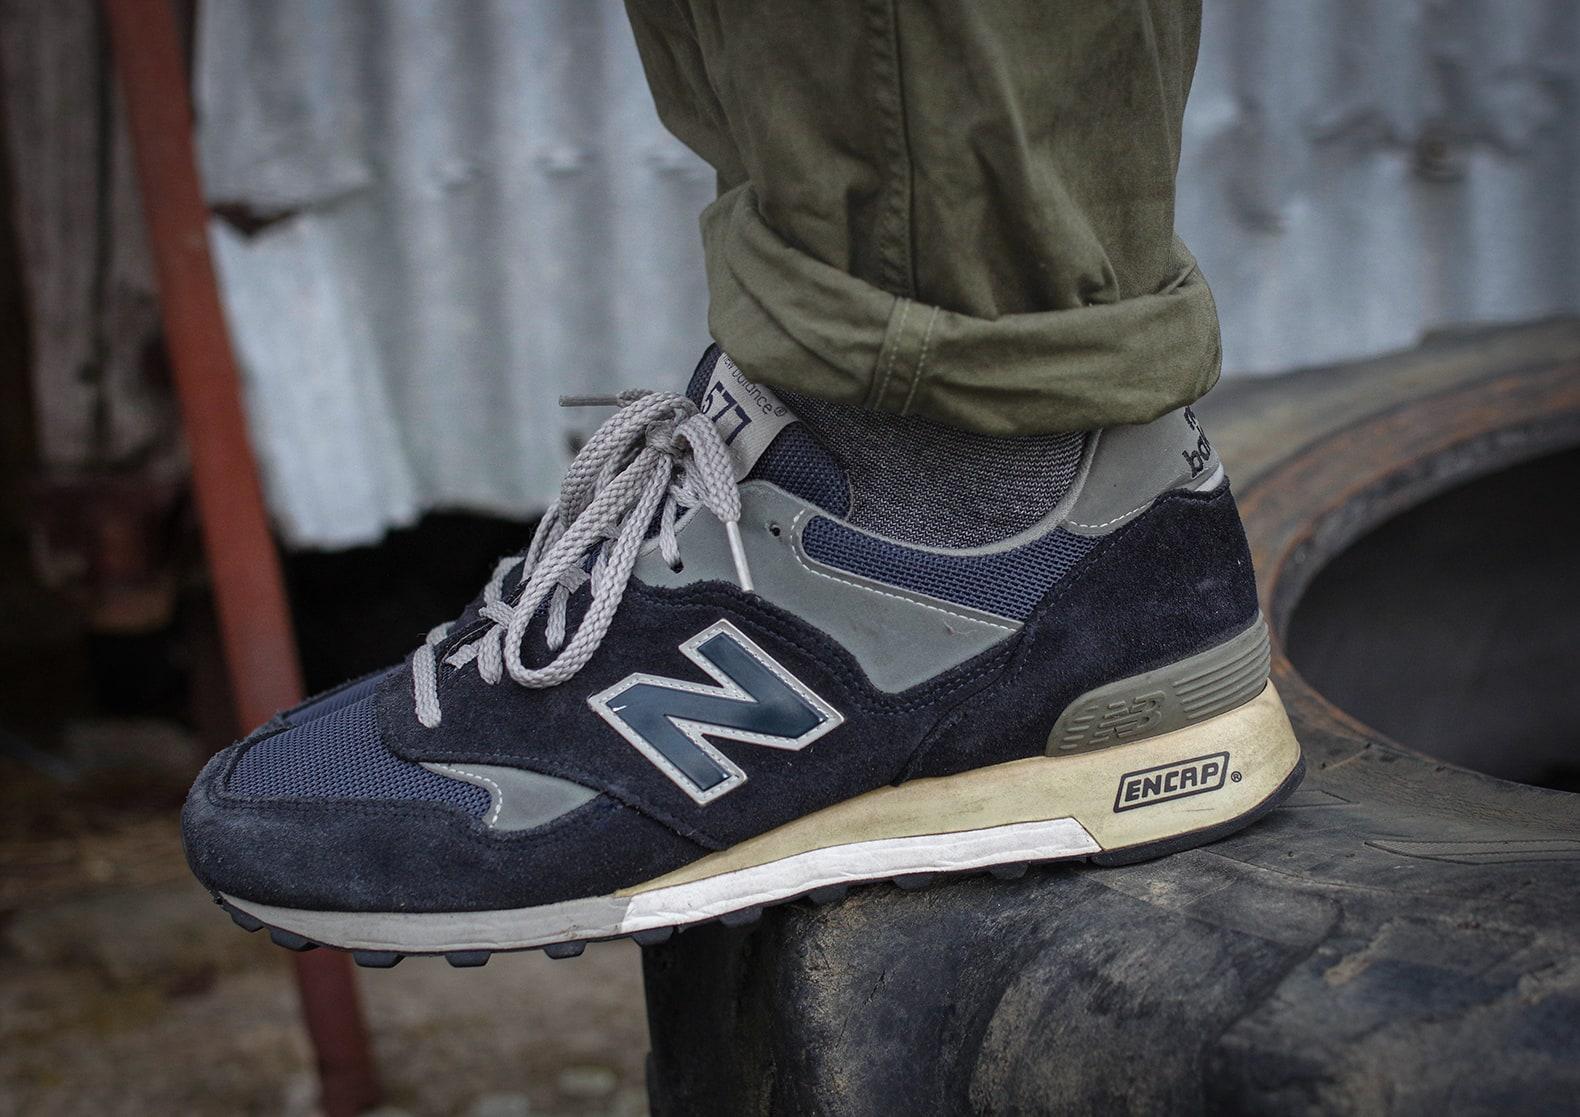 New Balance M 577NG Navy Grey og sneakers